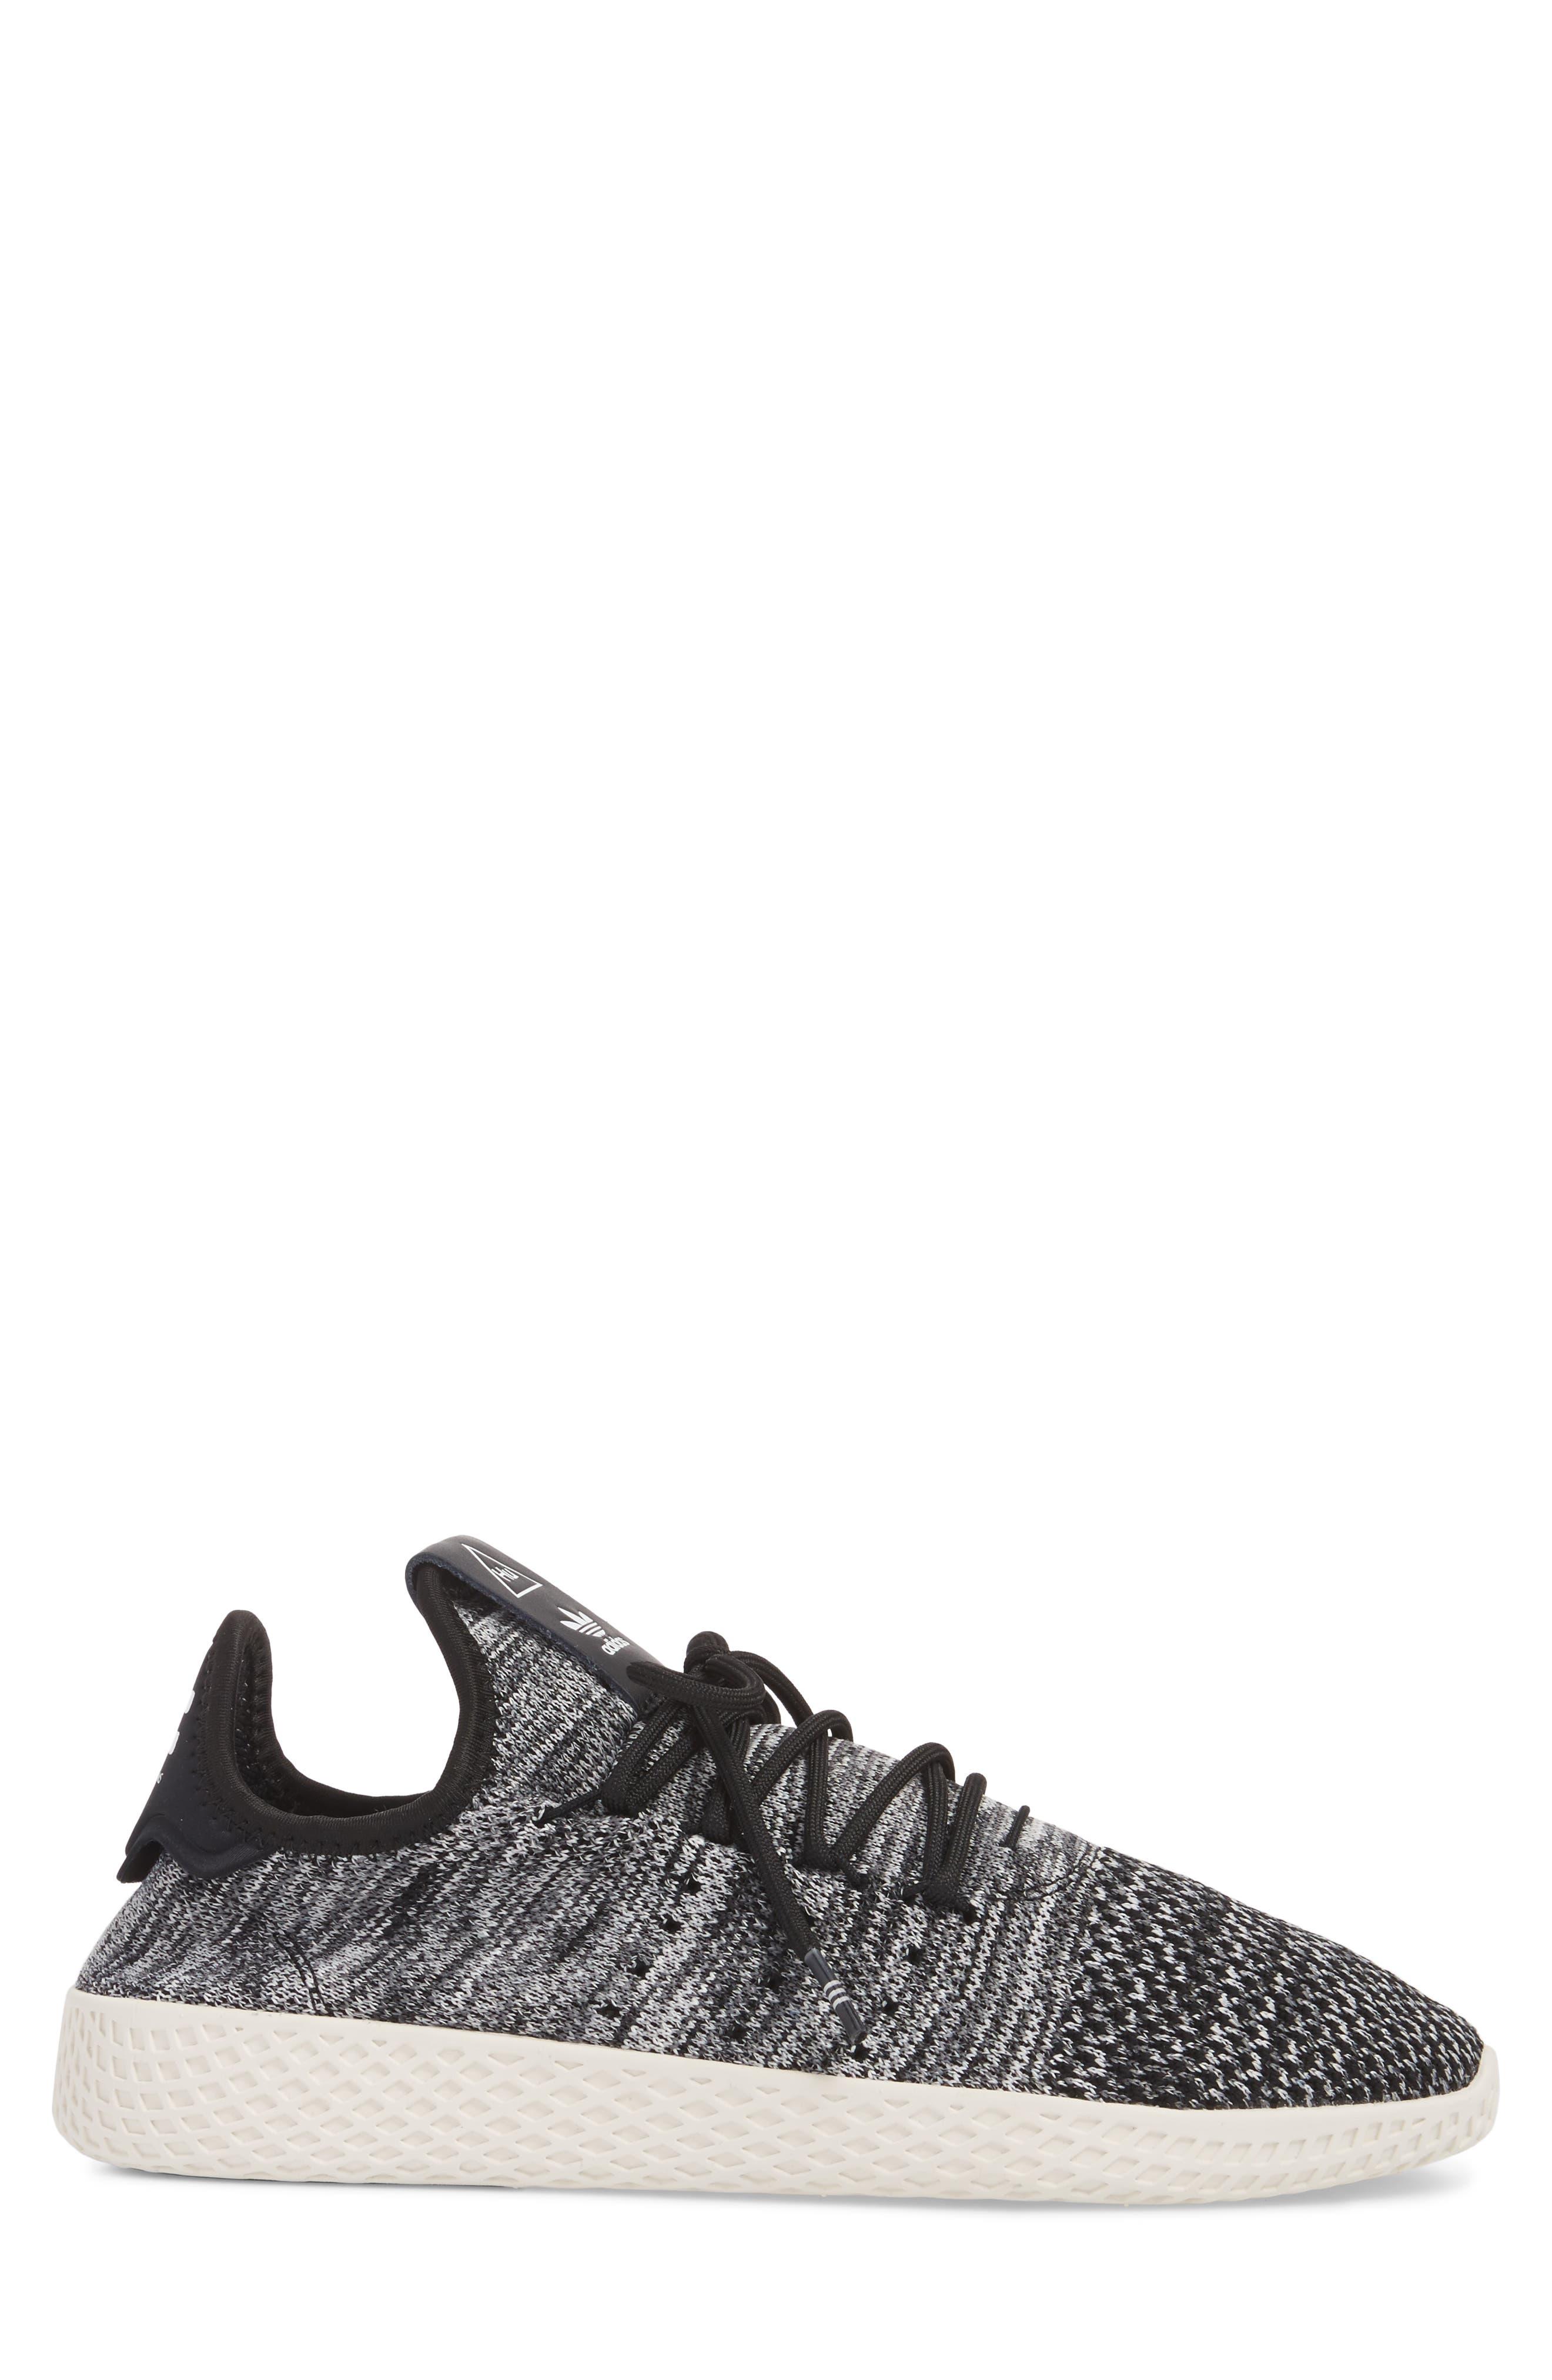 Pharrell Williams Tennis Hu Sneaker,                             Alternate thumbnail 3, color,                             020